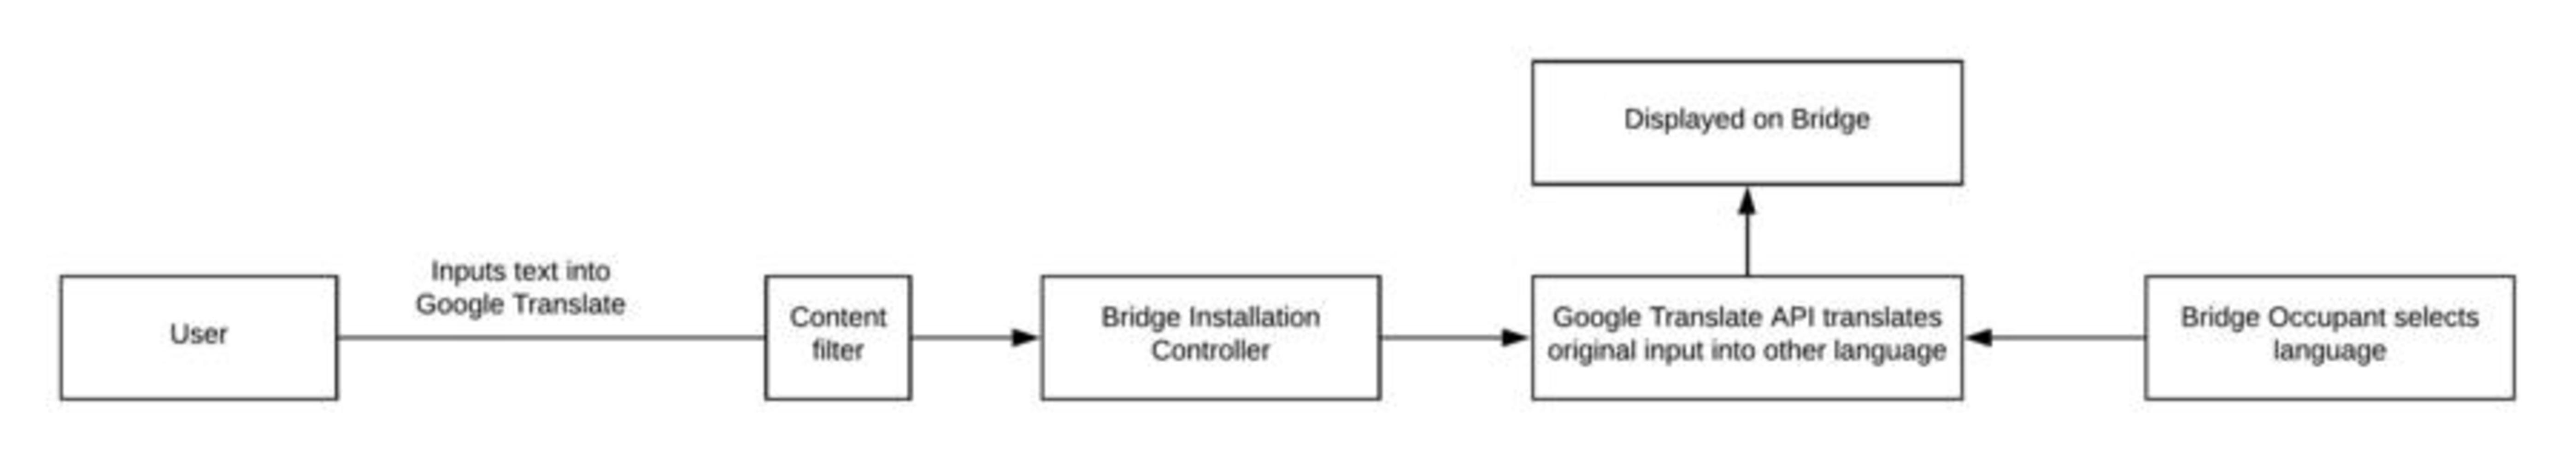 Blank diagram 3.thumb